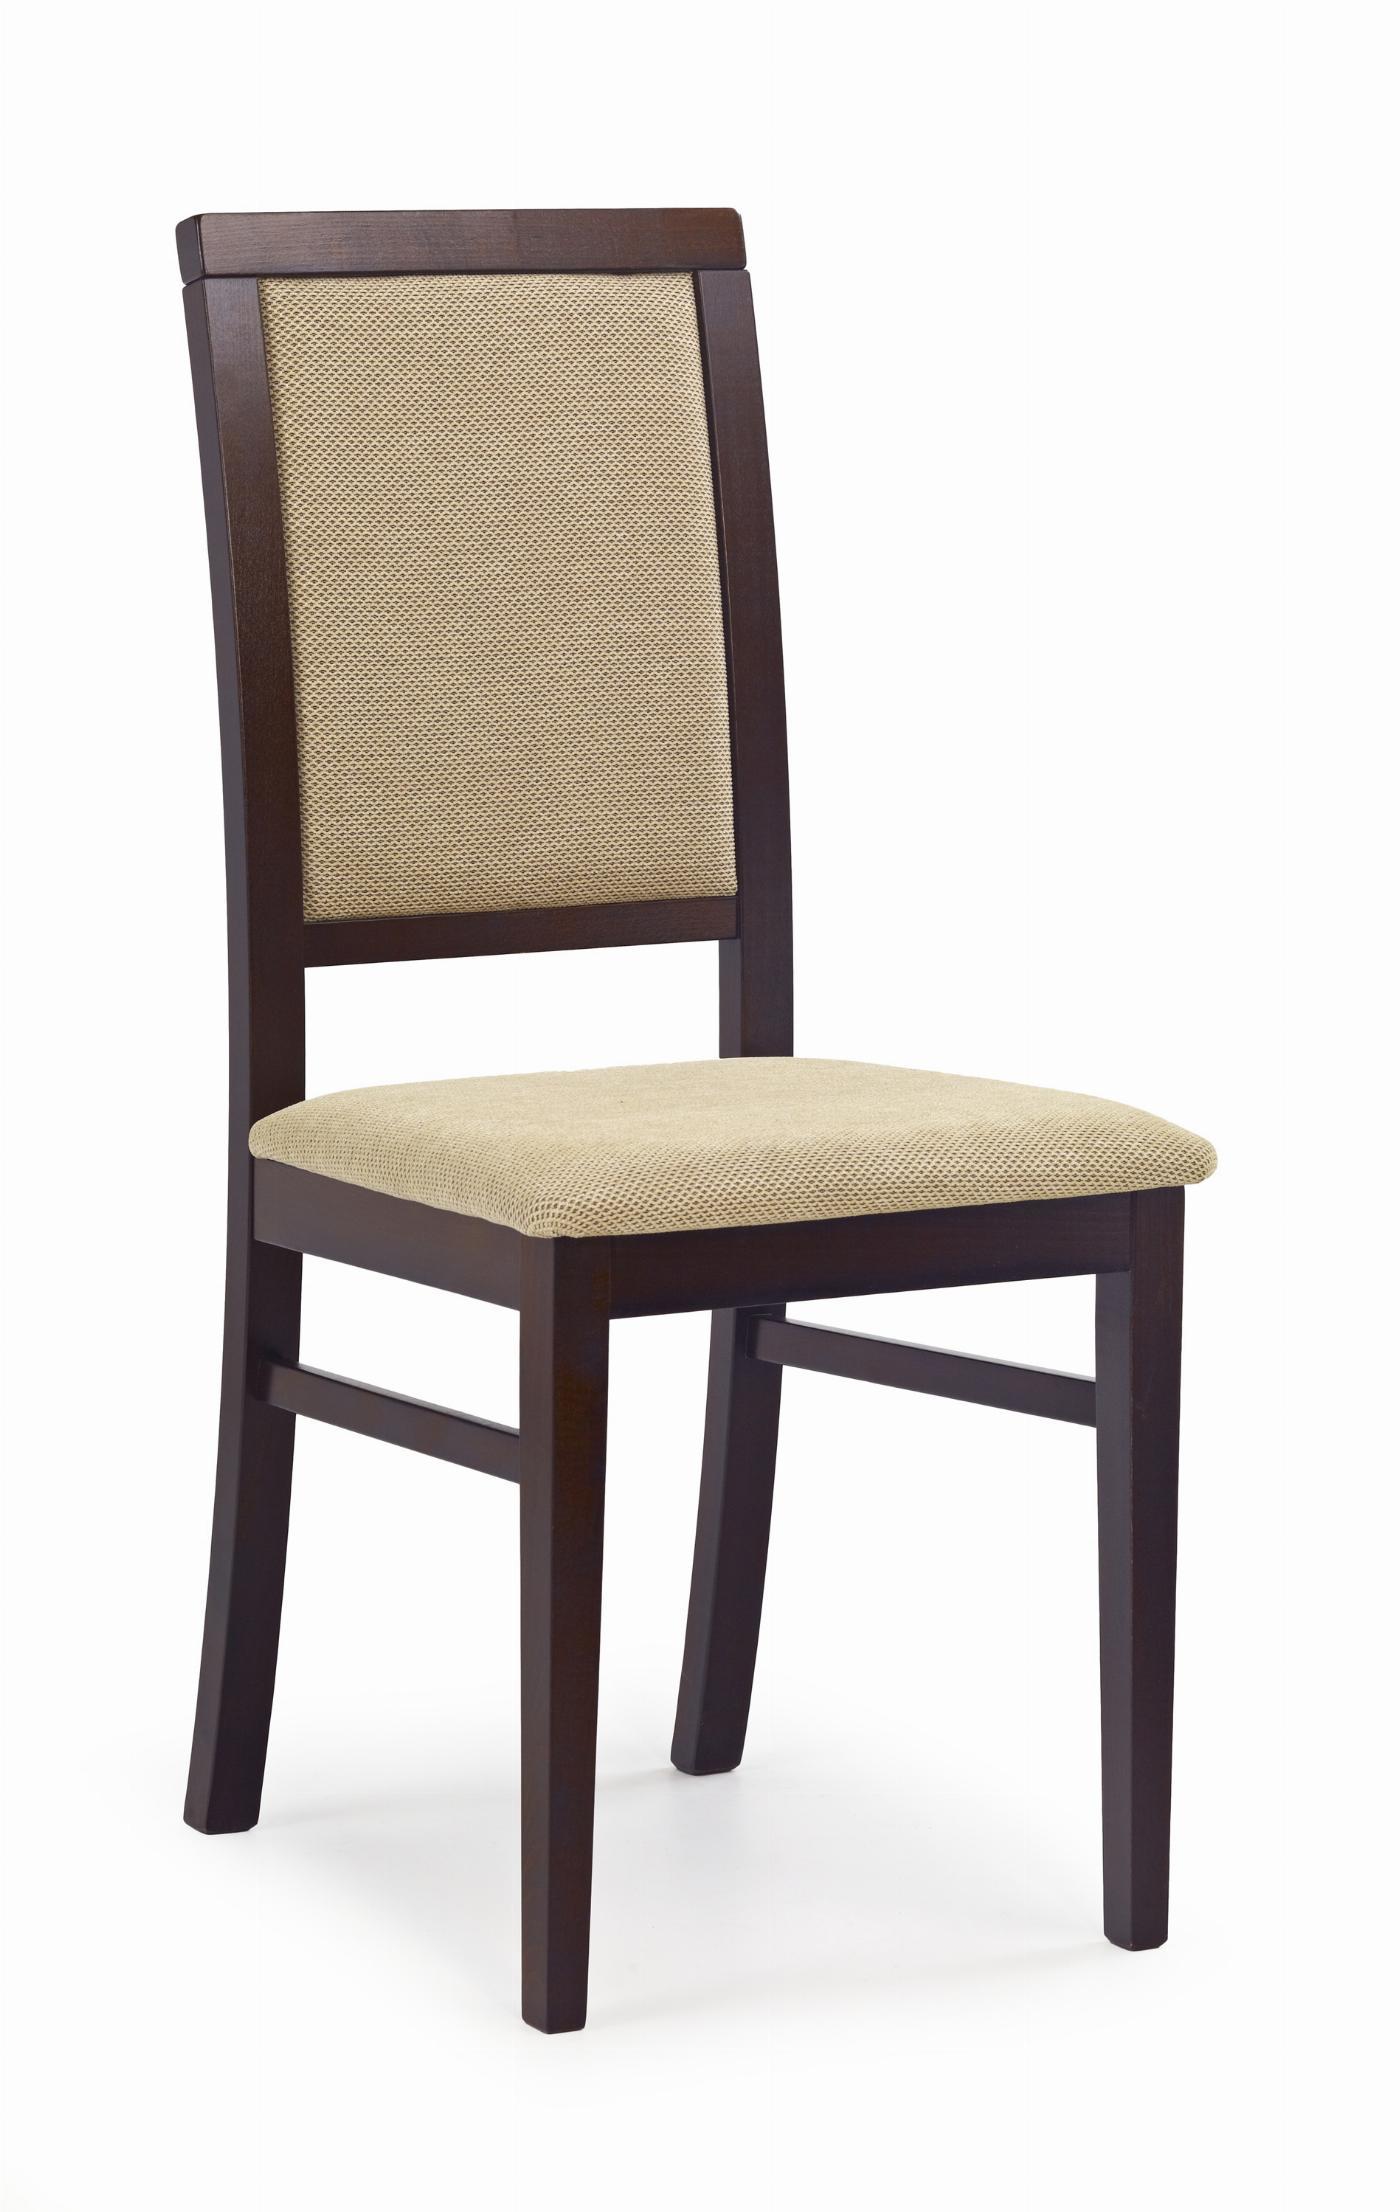 SYLWEK1 krzesło ciemny orzech, tkanina / tap: Torent Beige (1p=2szt)